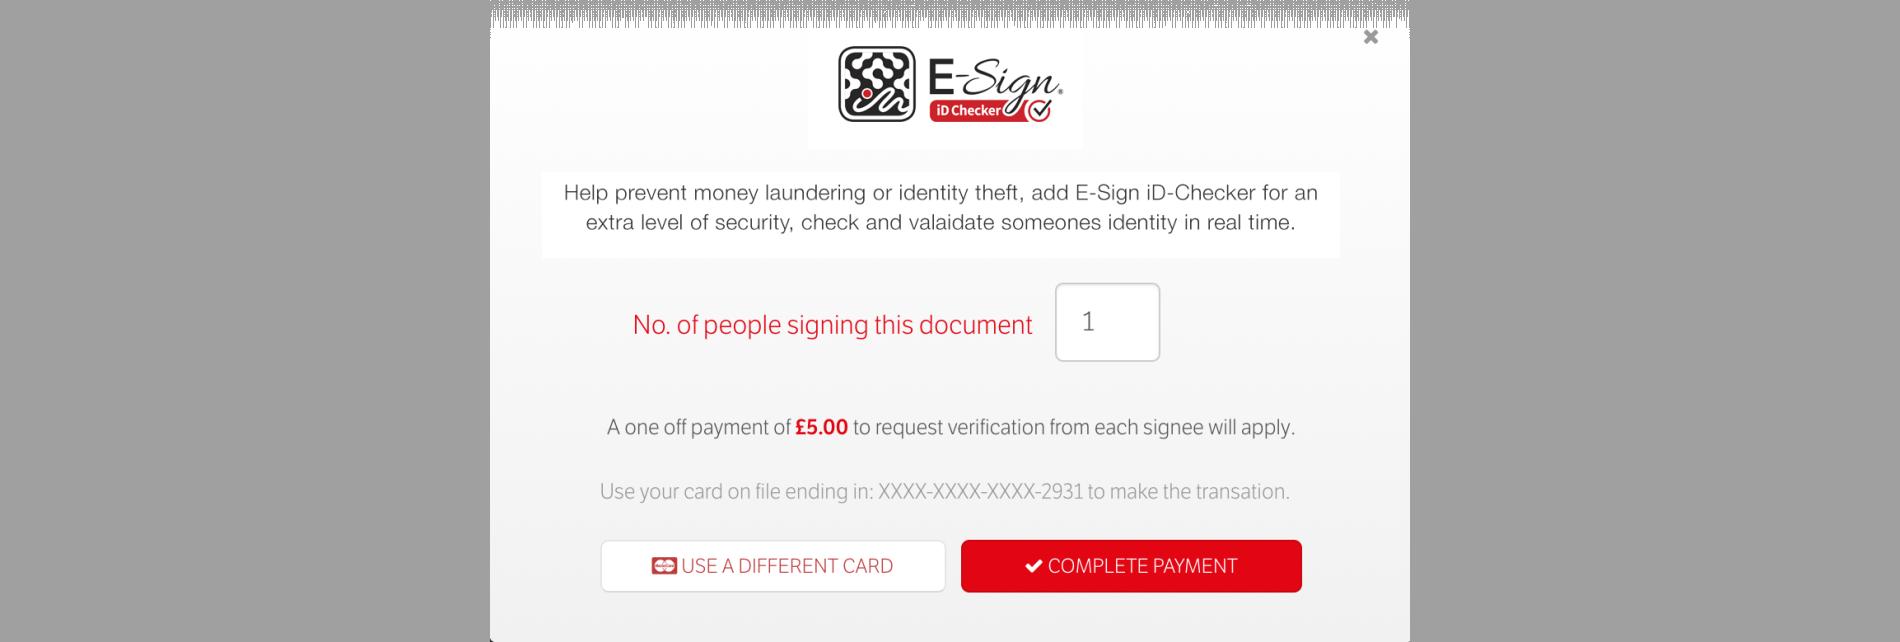 e-sign-veri-me-payment